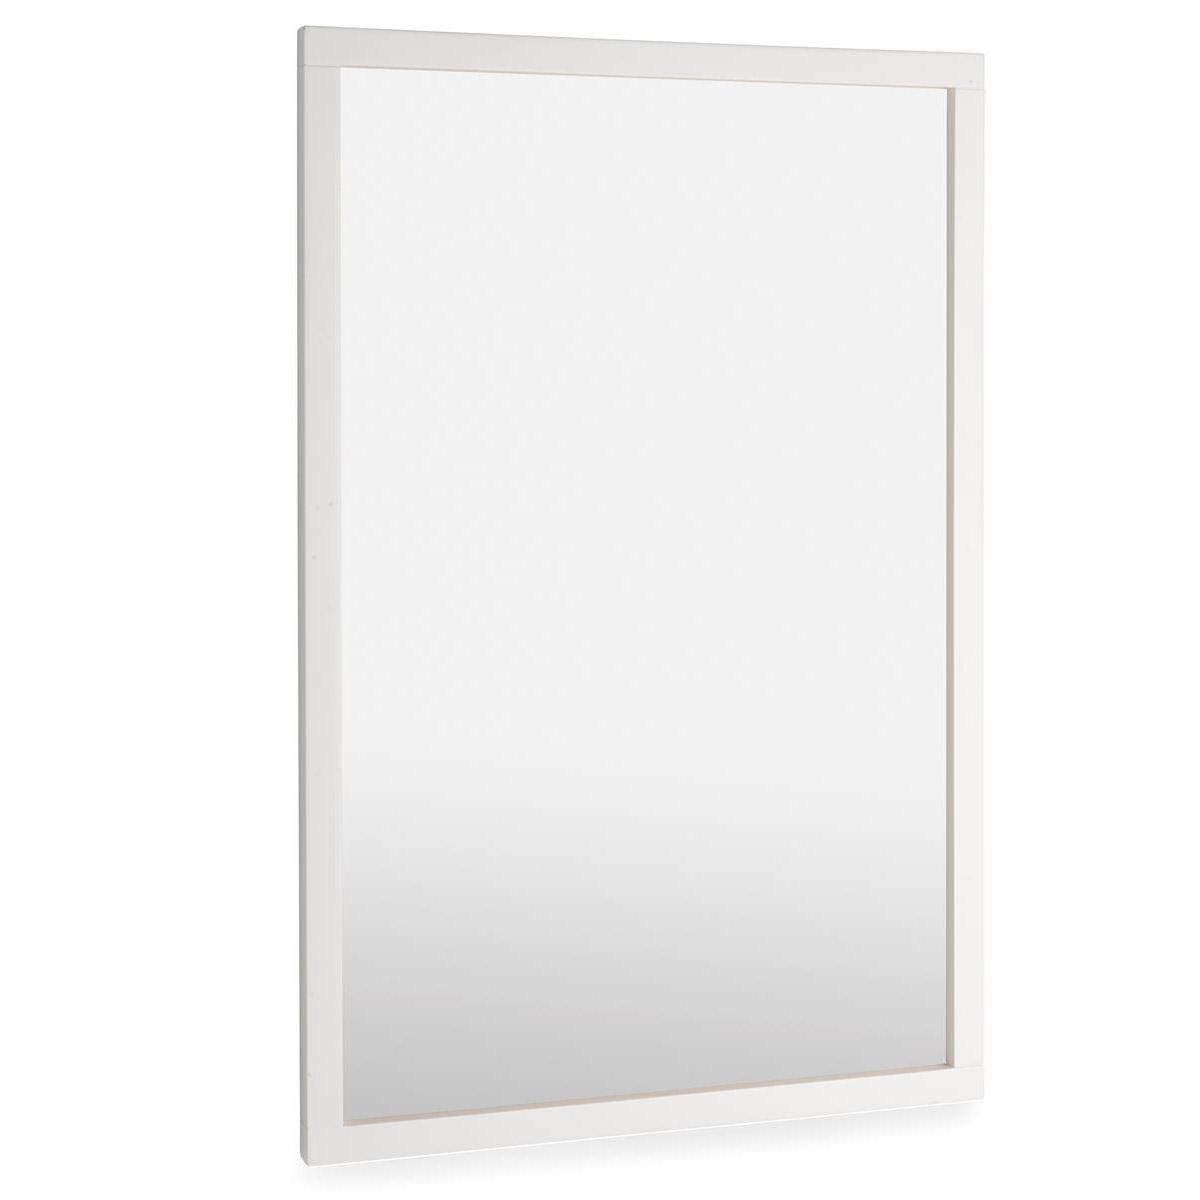 Confetti spegel 60x90 103665